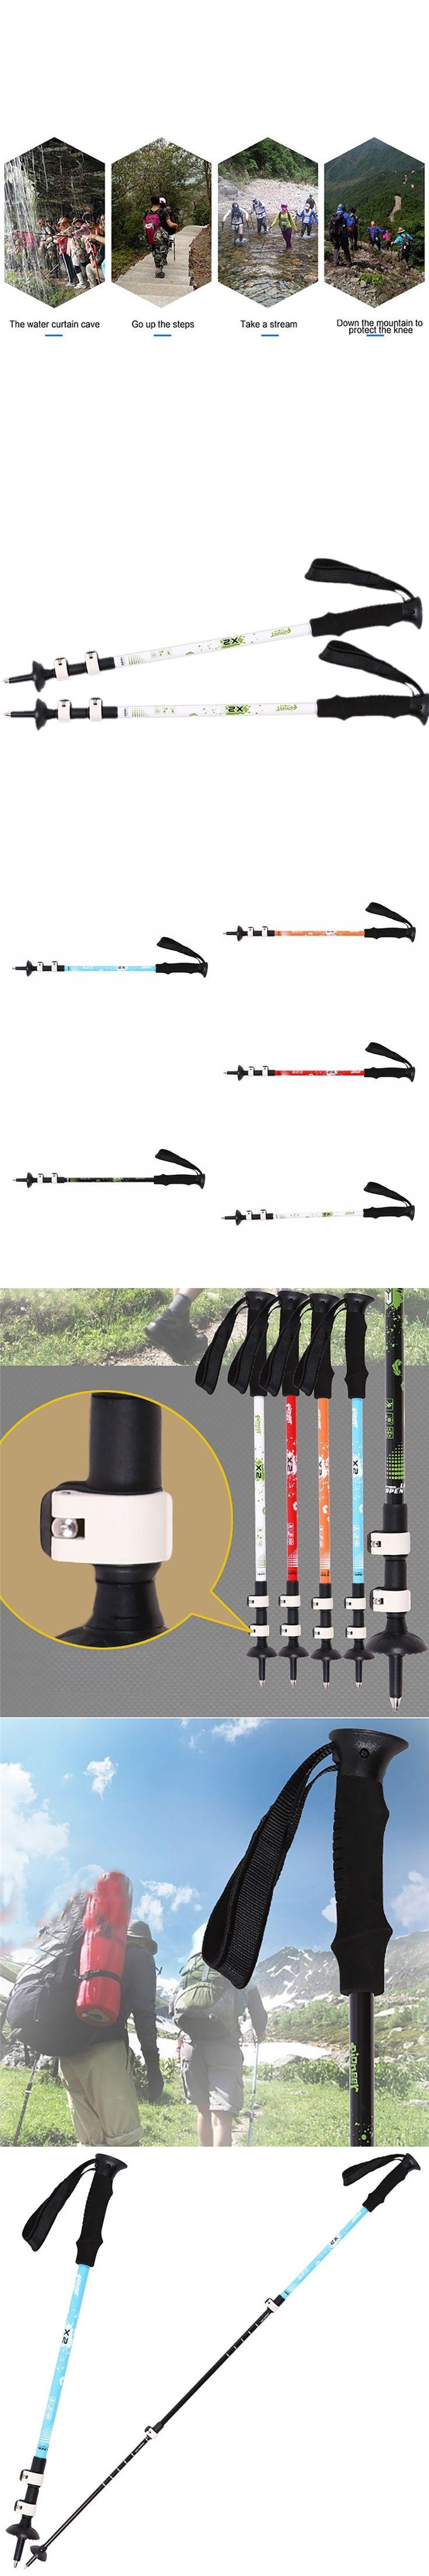 7075 Aluminum Fast Lock Manufacturing Handle EVA Mountain Nordic Walking Sticks Trekking Hiking Climbing Adjustable Handle Cane